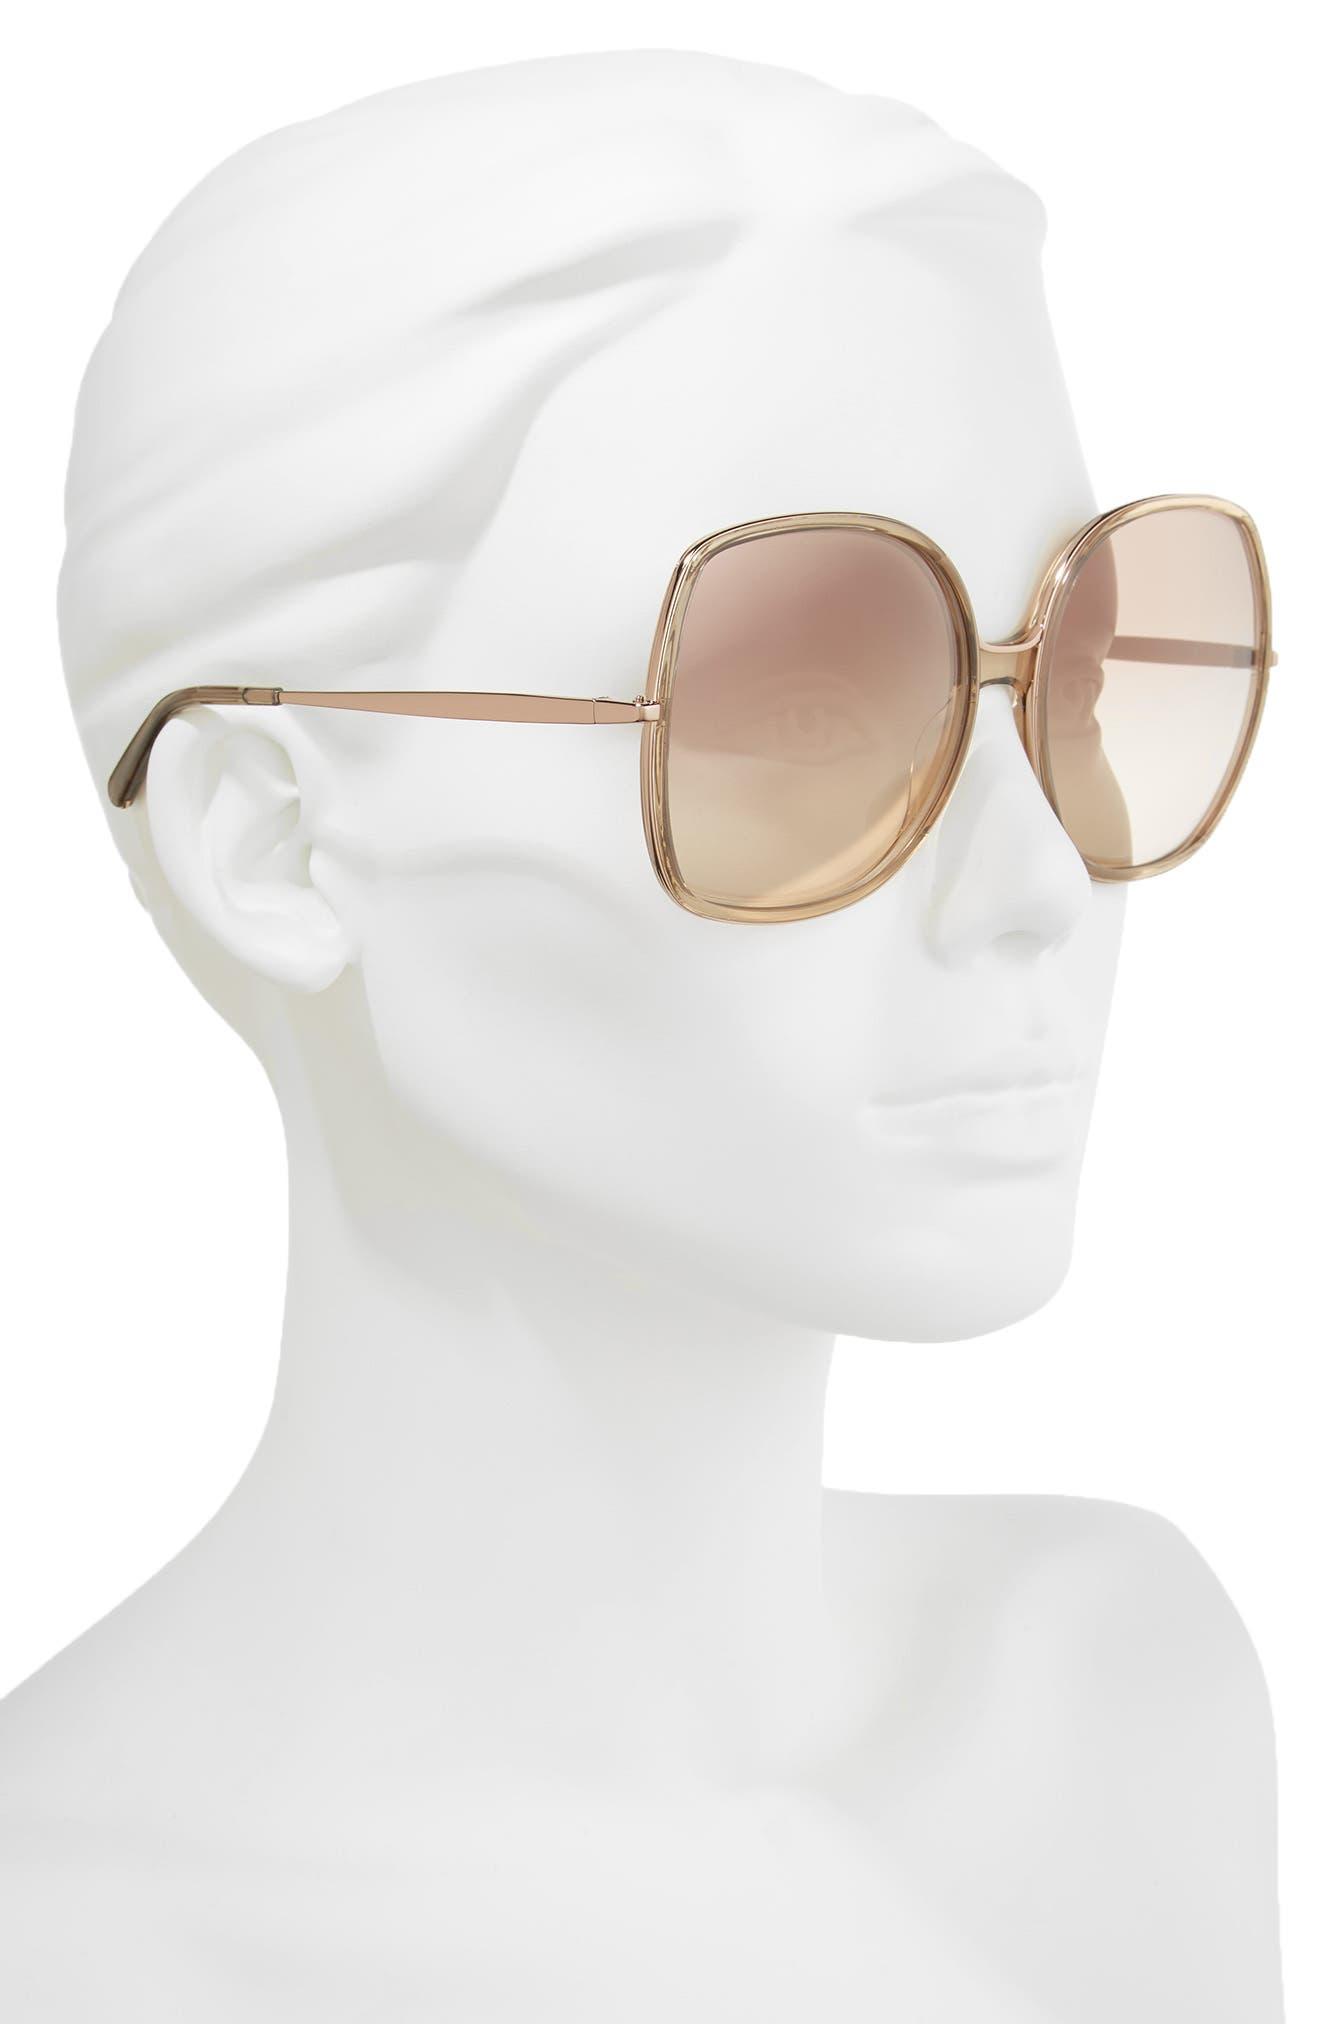 62mm Oversized Gradient Lens Square Sunglasses,                             Alternate thumbnail 2, color,                             Nude